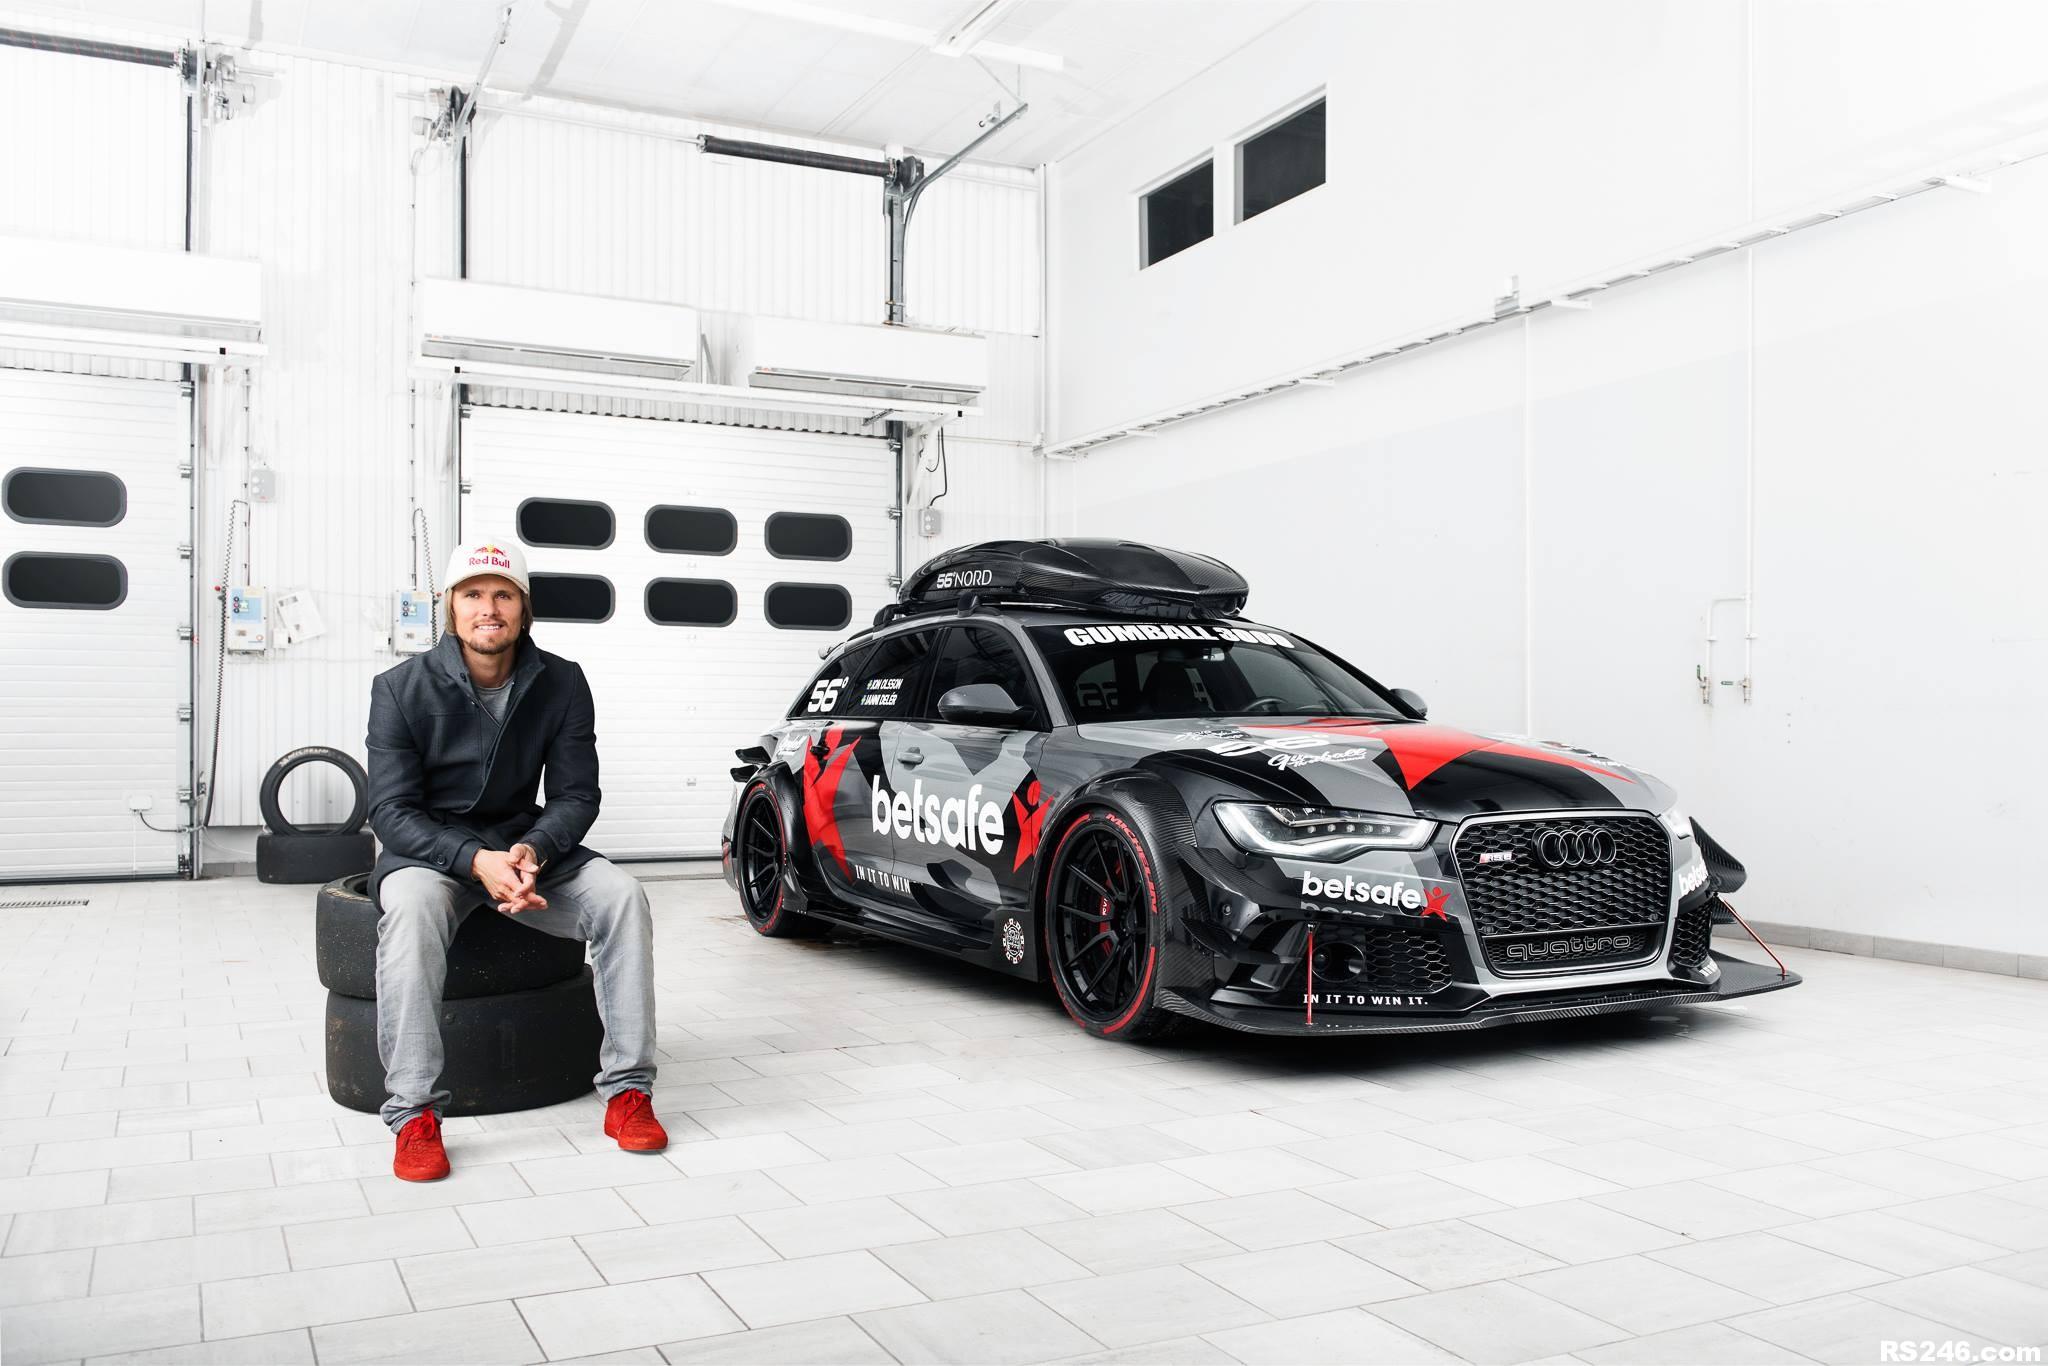 Audi Rs6 Dtm By Jon Olsson Rs246 Com